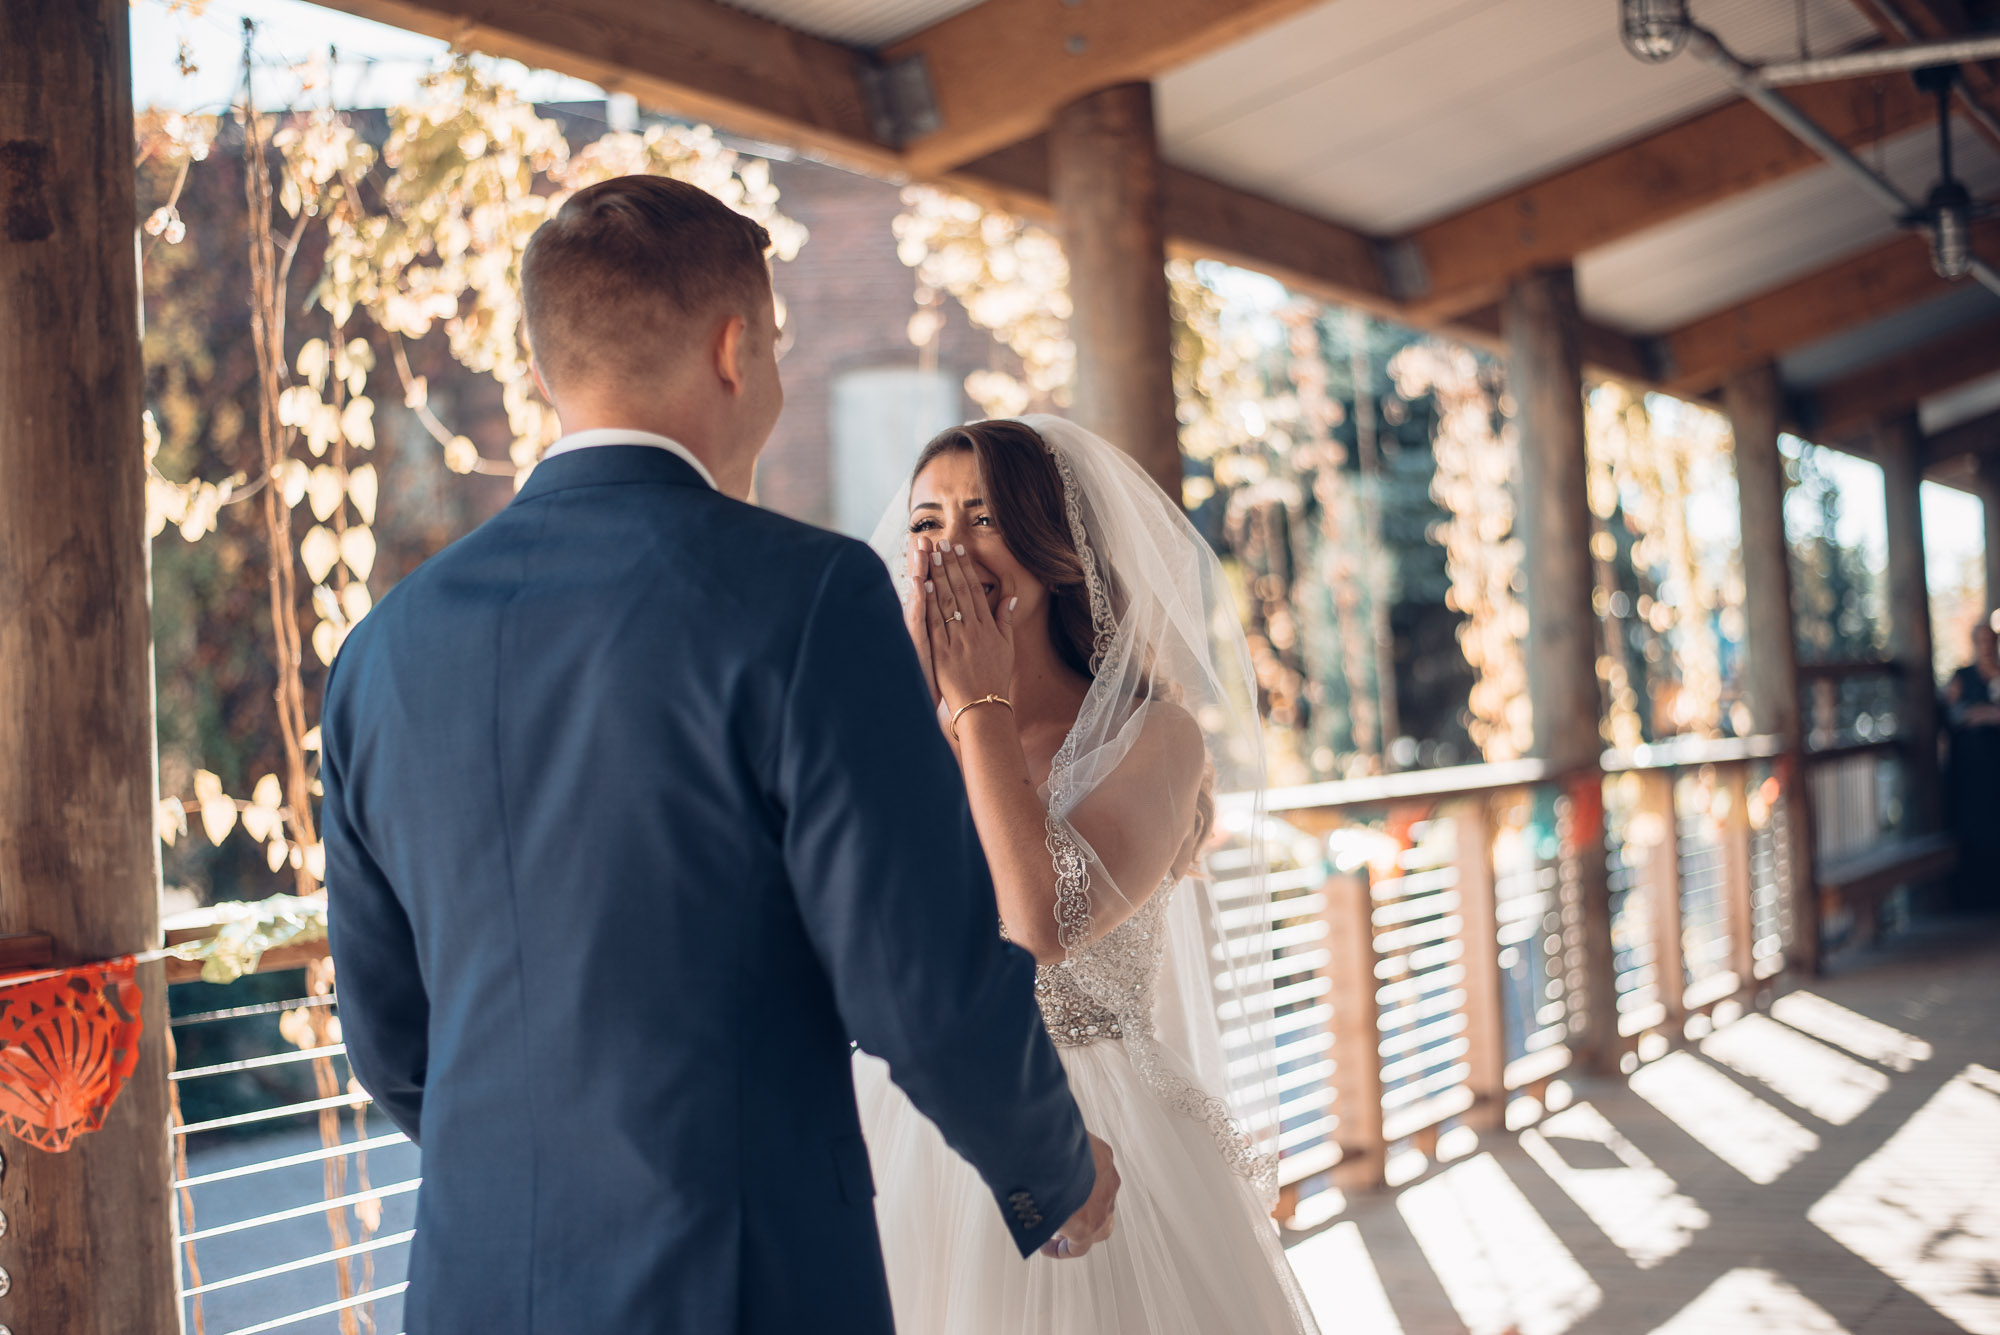 woodwinds_wedding_171020_web-24.jpg